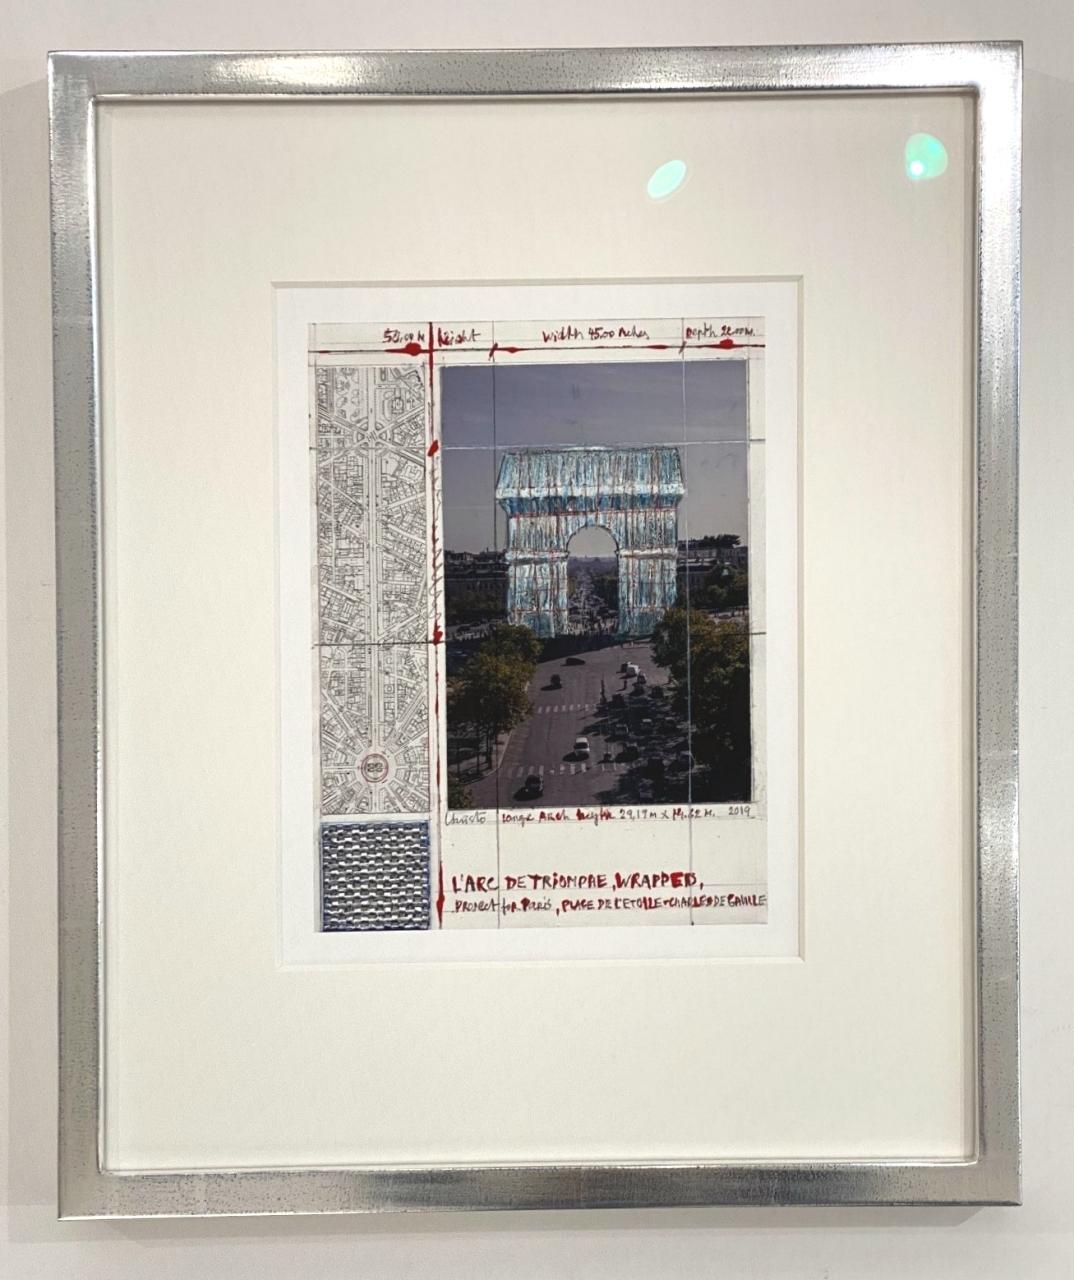 L'Arc De Triomphe II, Wrapped, gerahmt im Studiorahmen